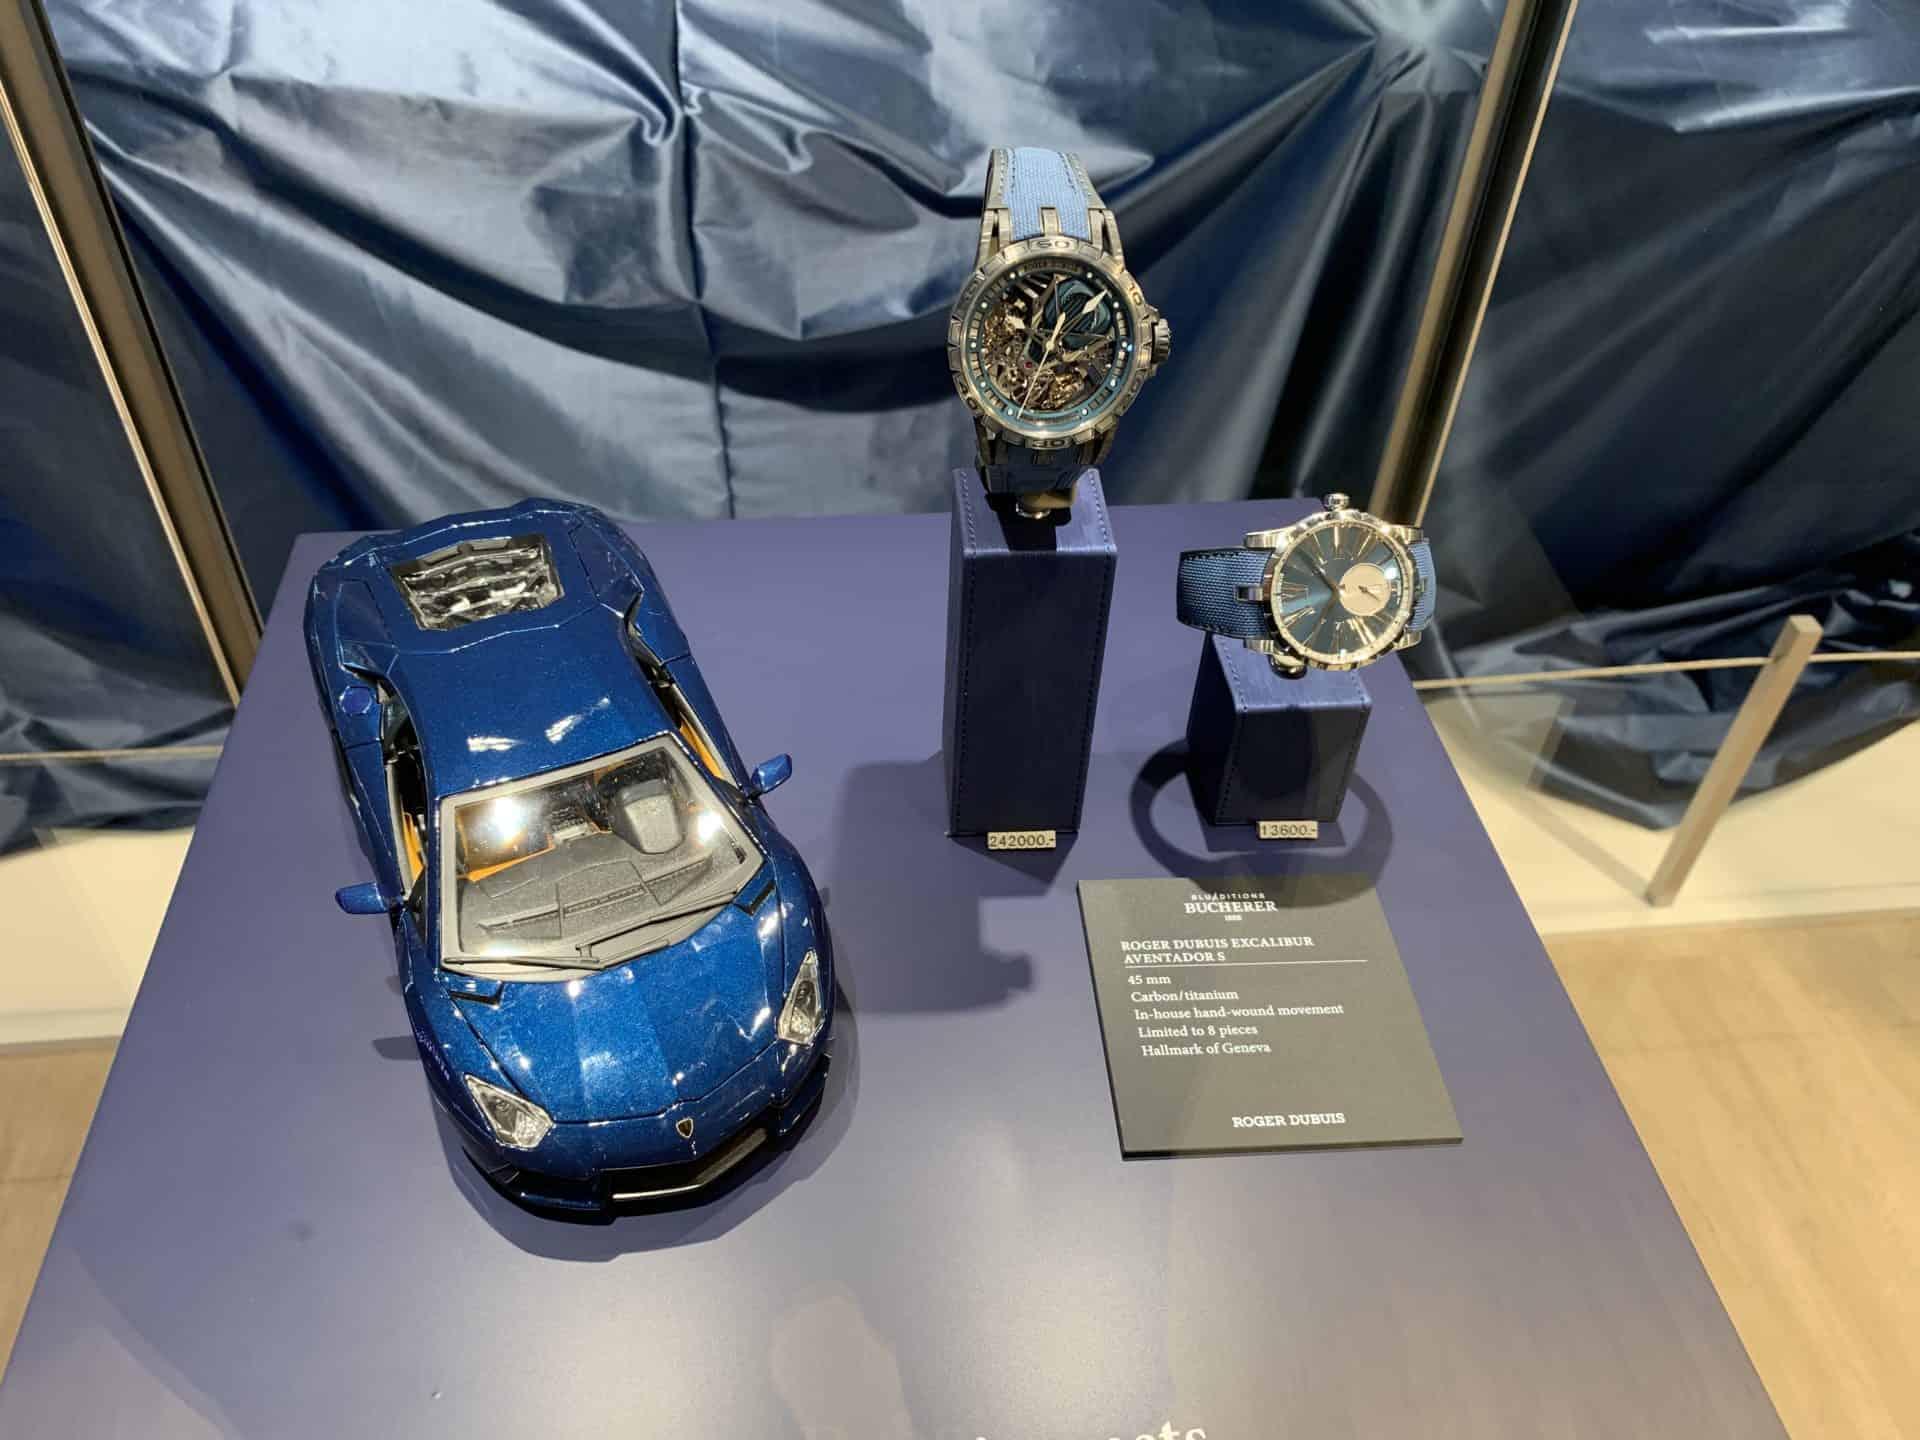 Lamborghini, Roger Dubuis und Bucherer Blue Editions im Dreiklang